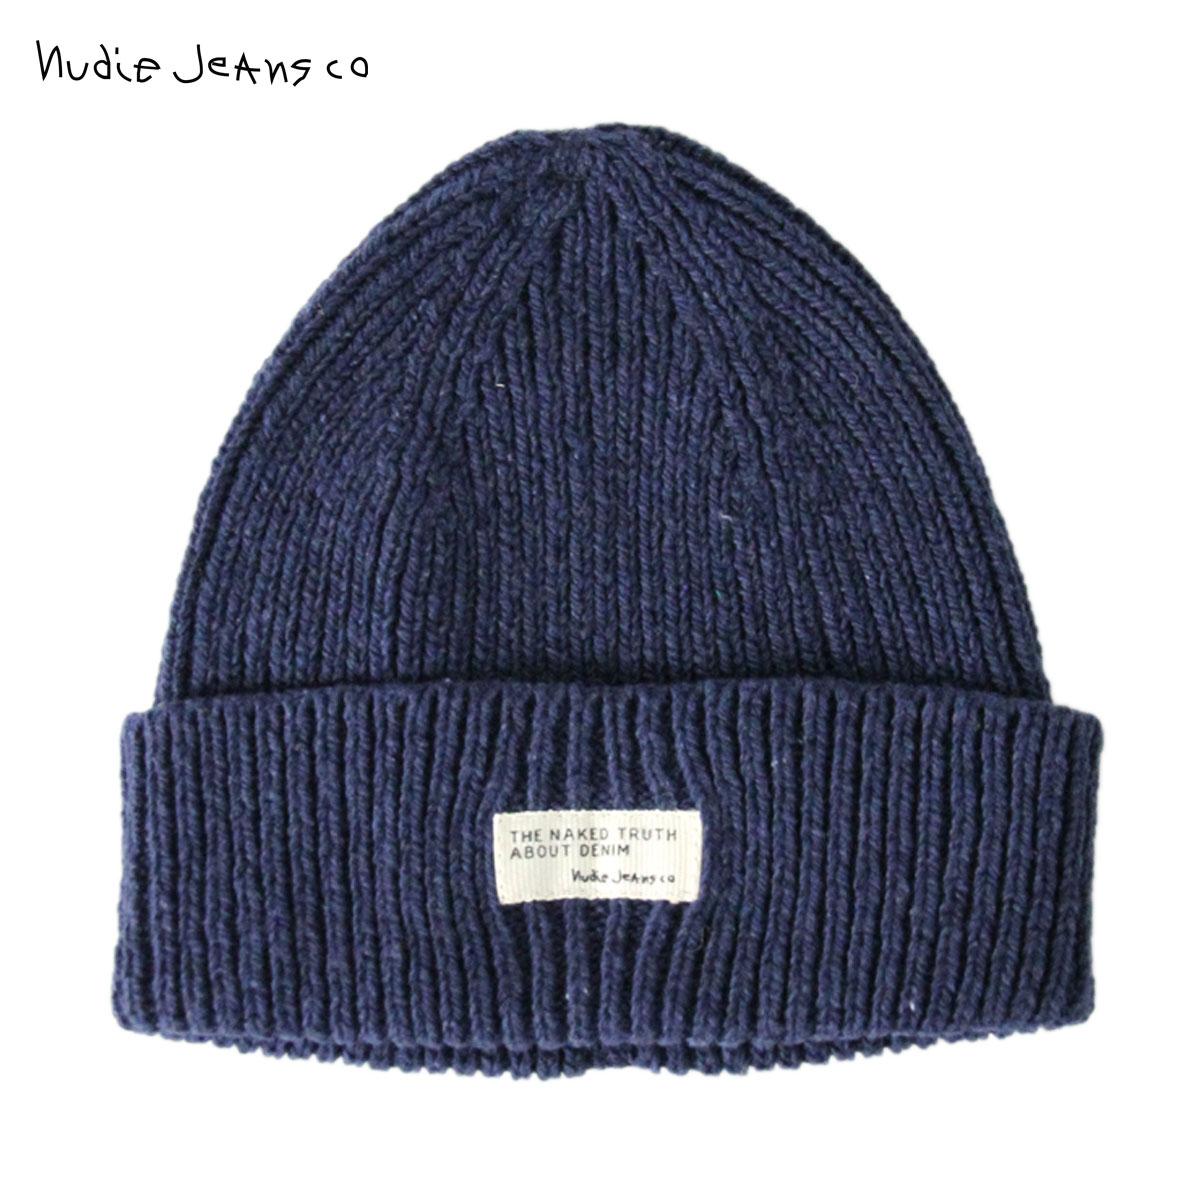 7a5ecada Rakuten Ichiba shop MIXON: Nudie jeans Nudie Jeans regular store hat  Nicholson Beanie Dark Blue 180503 D15S25 | Rakuten Global Market